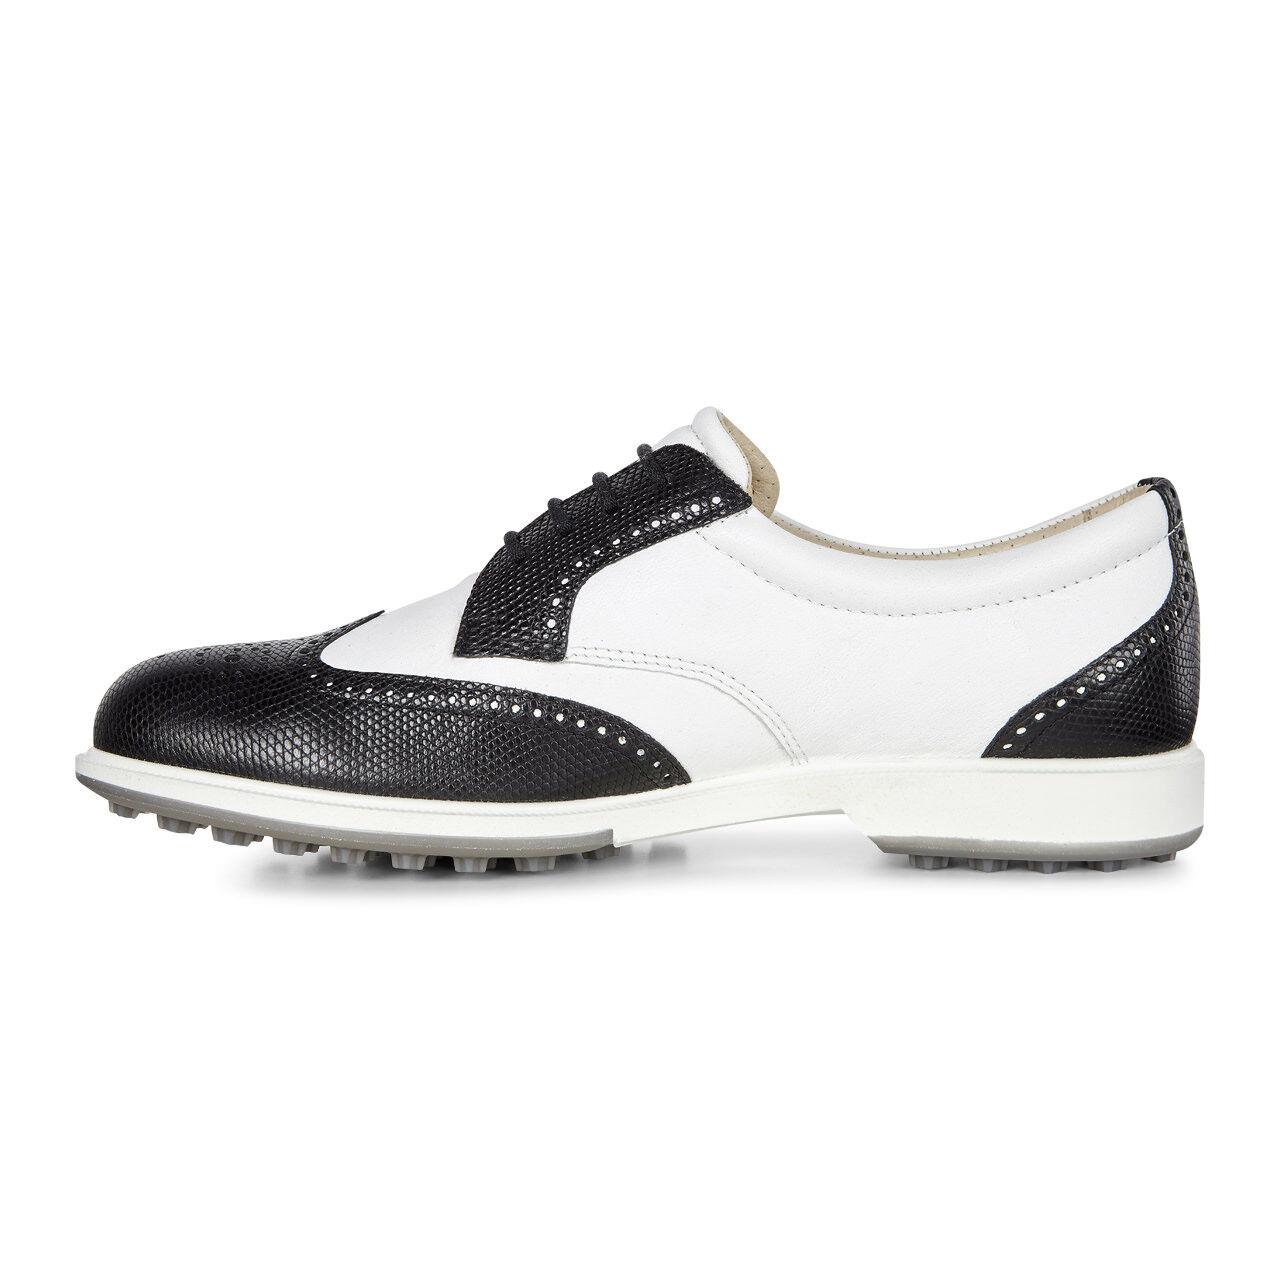 ECCO Classic Golf Hybrid Shoes Ecco 2WRtk